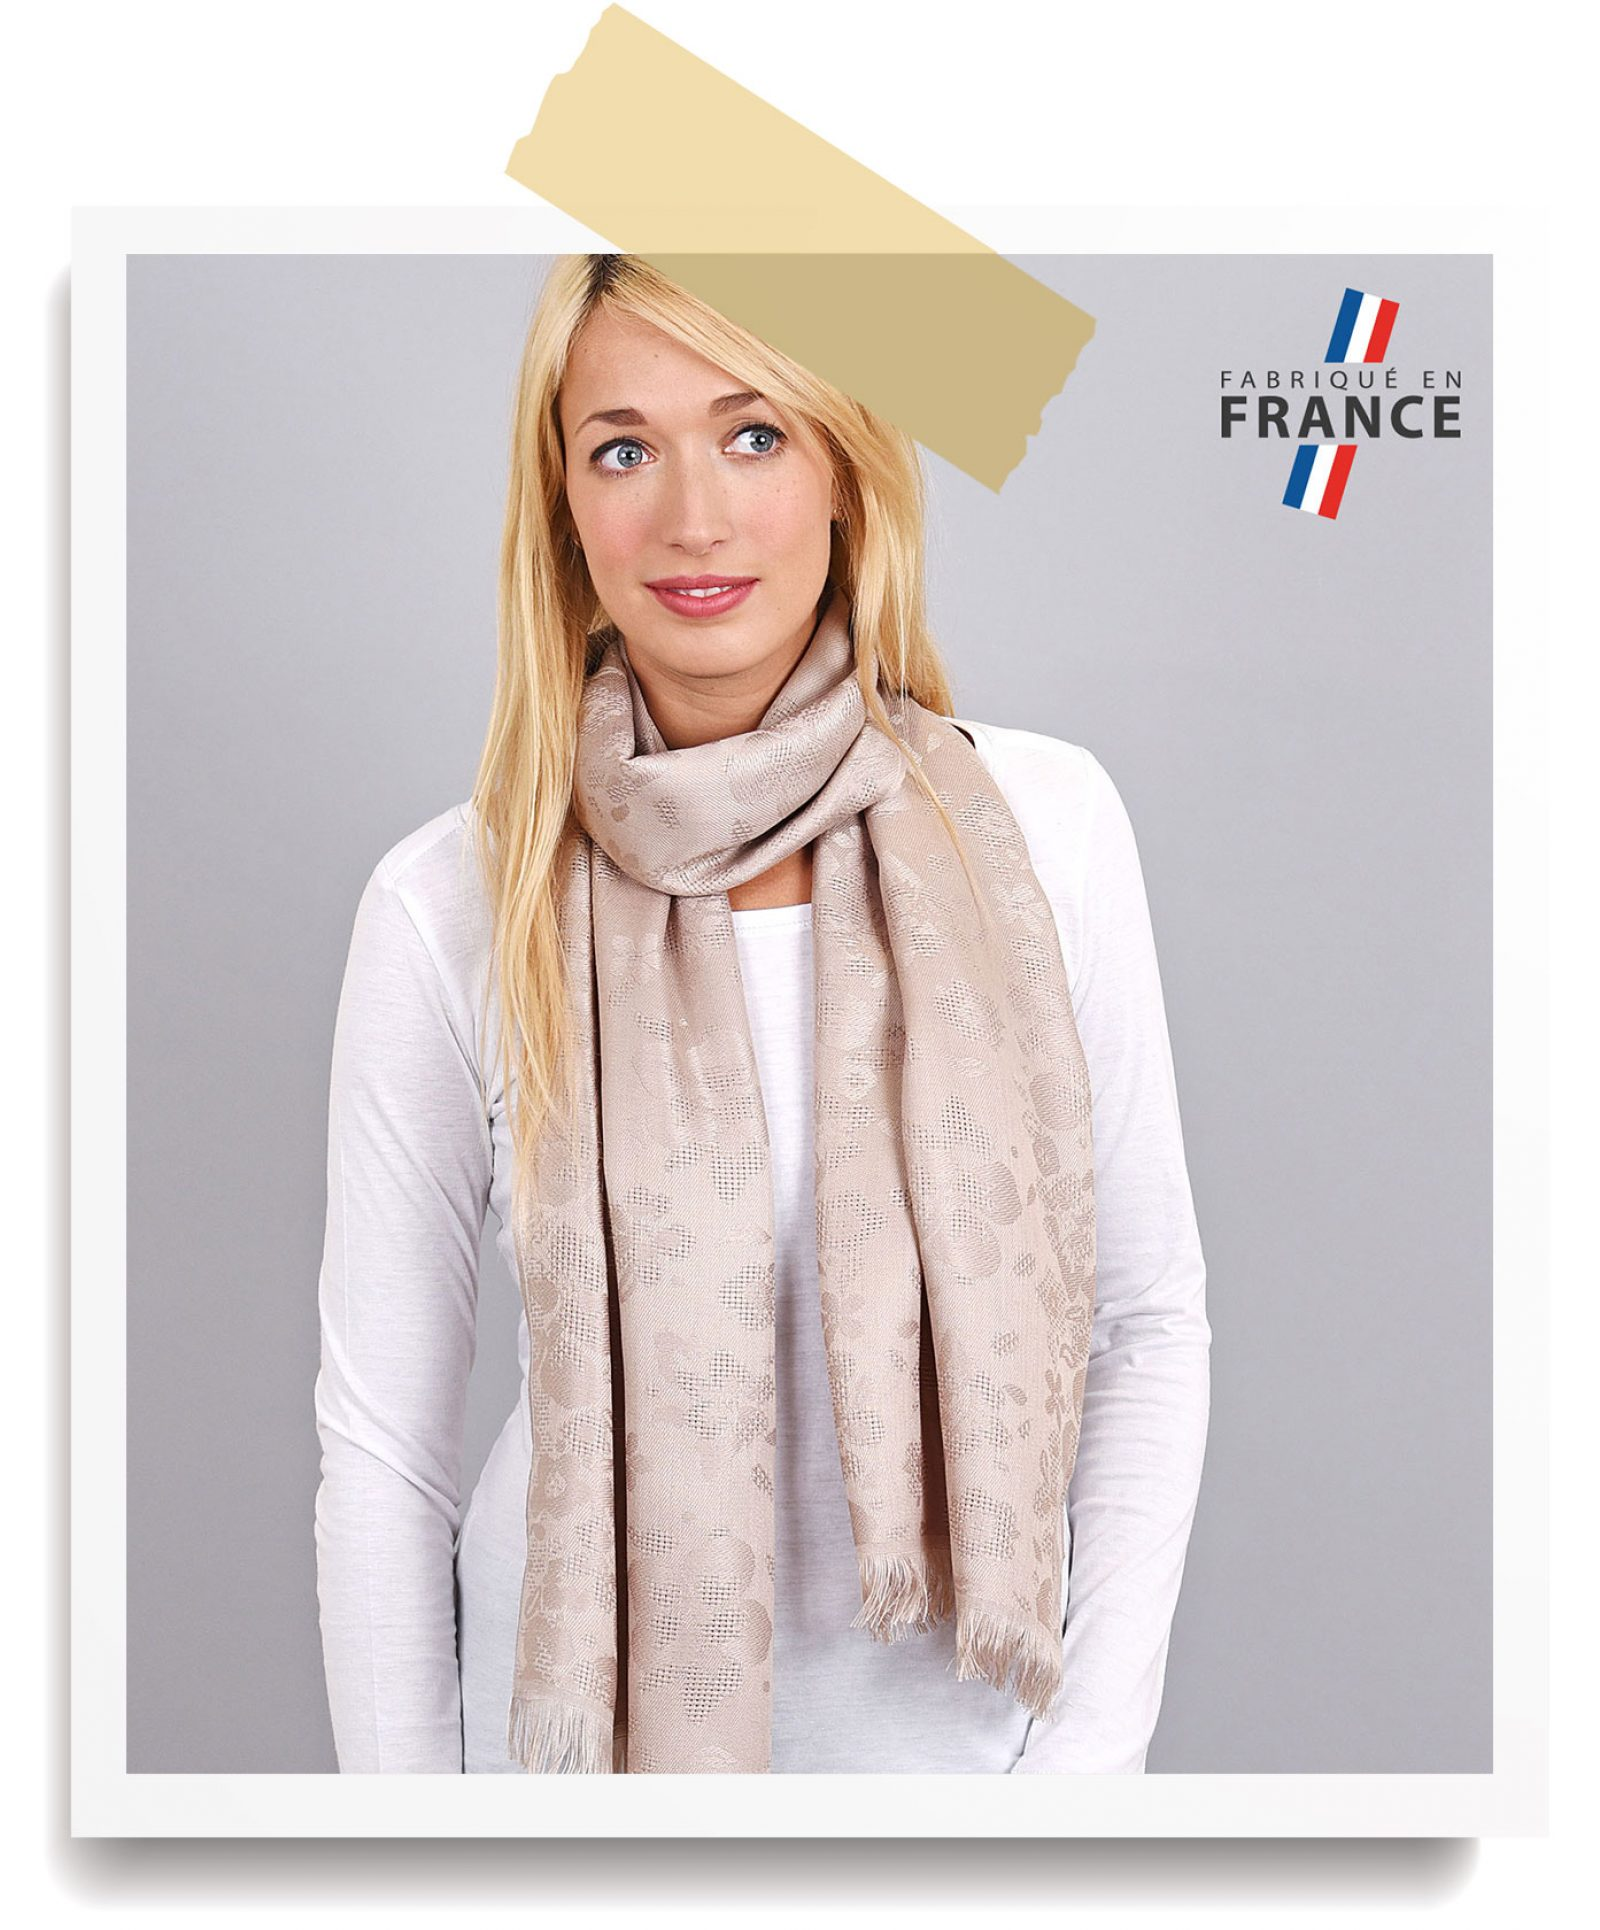 http://lookbook.allee-du-foulard.fr/wp-content/uploads/2018/06/0680-ADF-Accessoires-de-mode-LB-Soldes-Ete-echarpe-bauduen-1600x1930.jpg